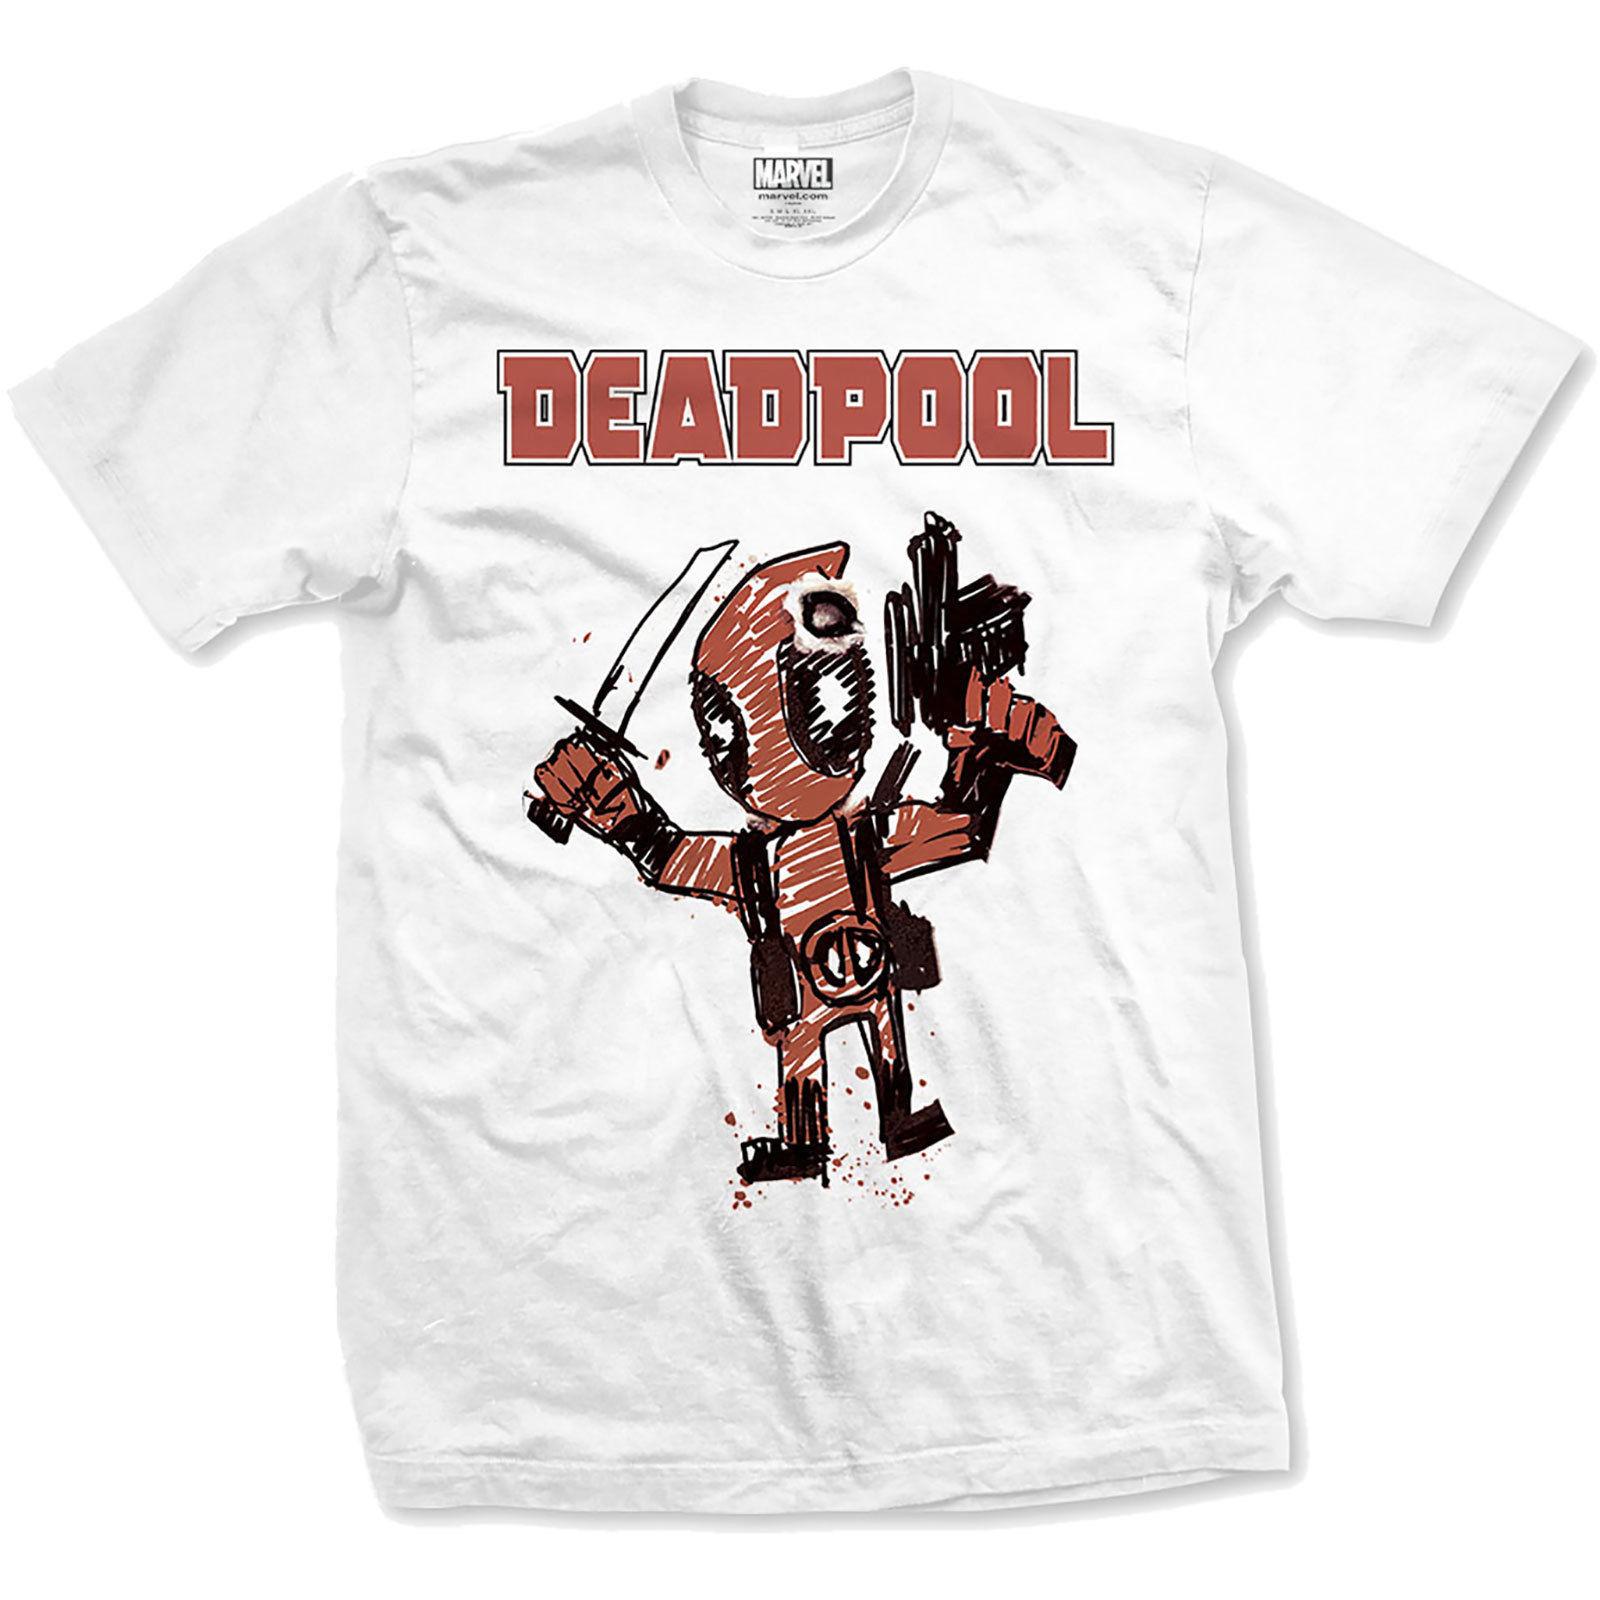 Deadpool Cartoon Bullet (Large) image